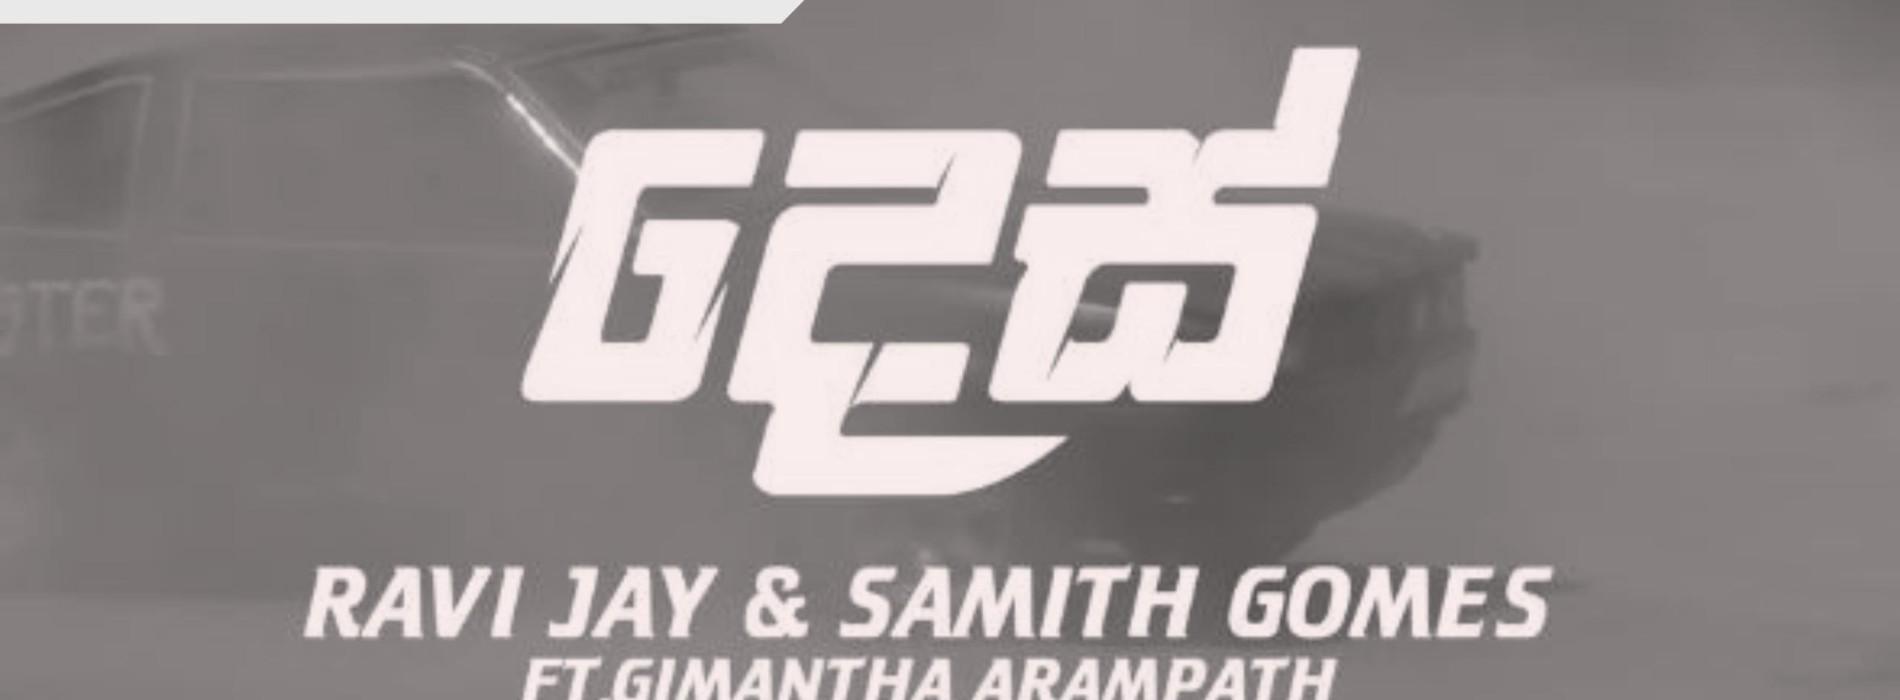 Ravi Jay x Samith Gomes Ft. Gimantha – Dhess (දෙස්)